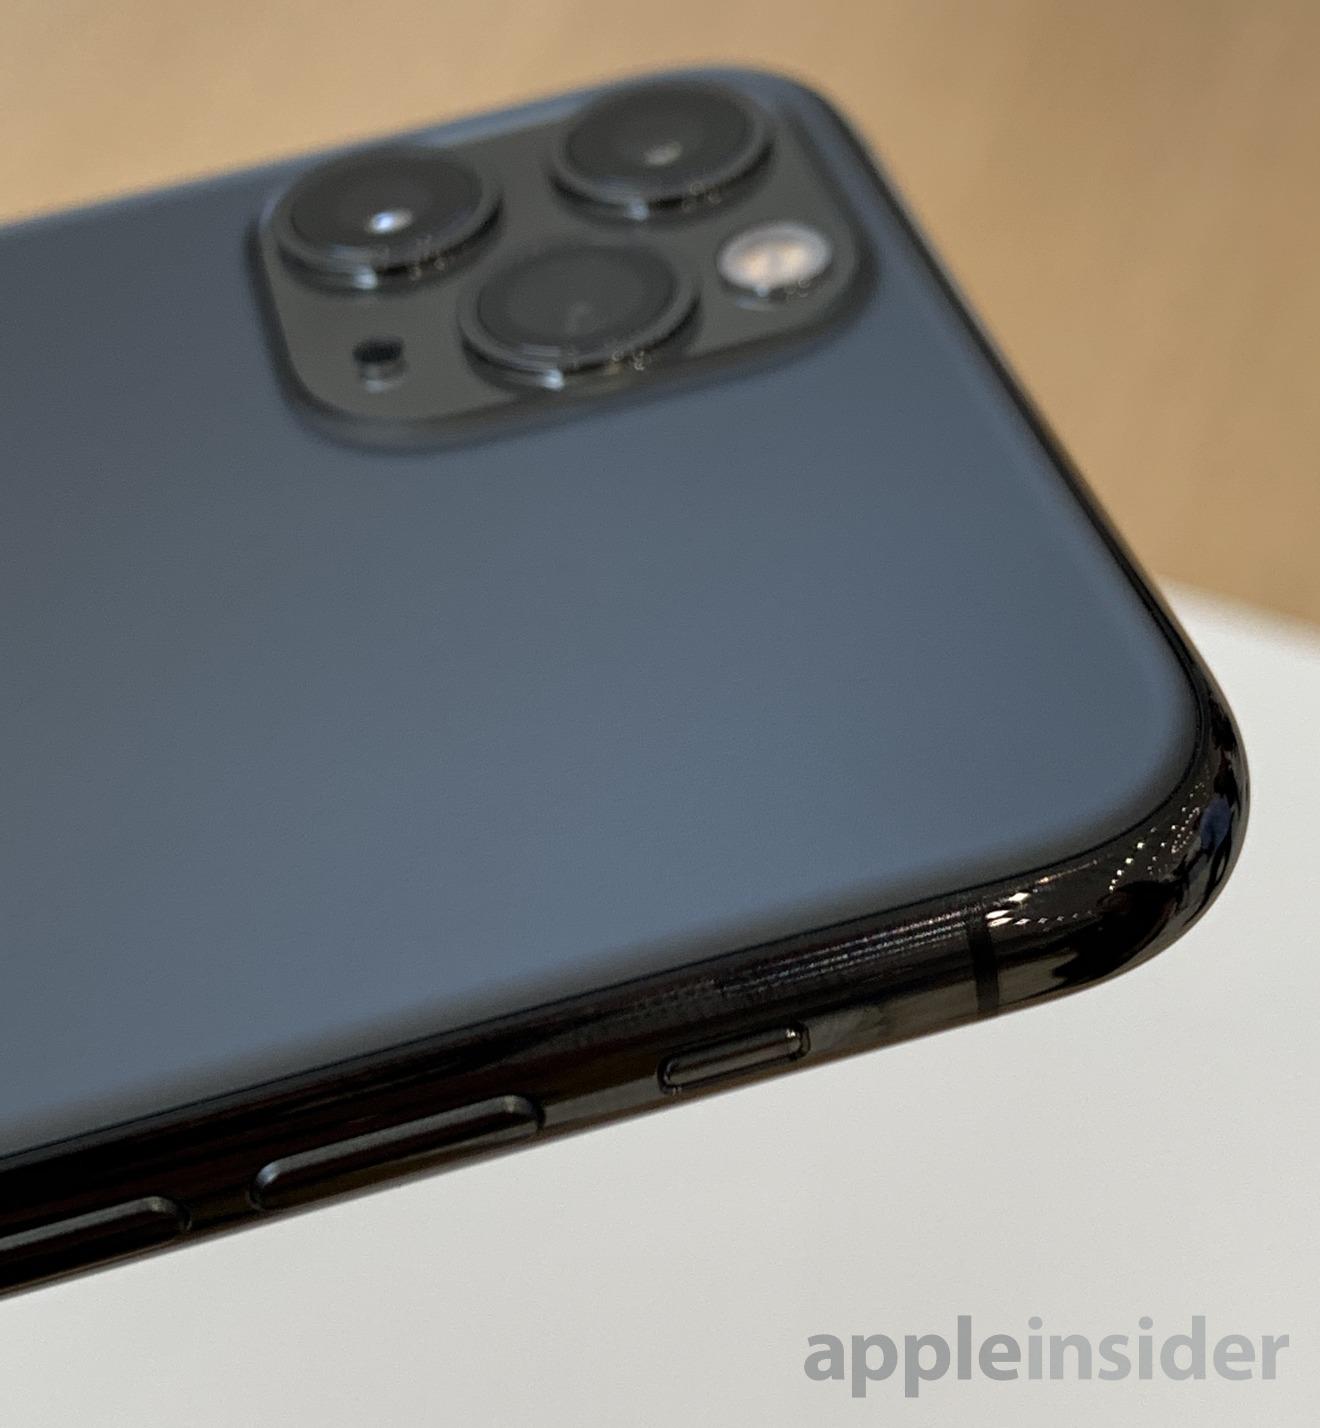 iPhone 11 Pro Max in black